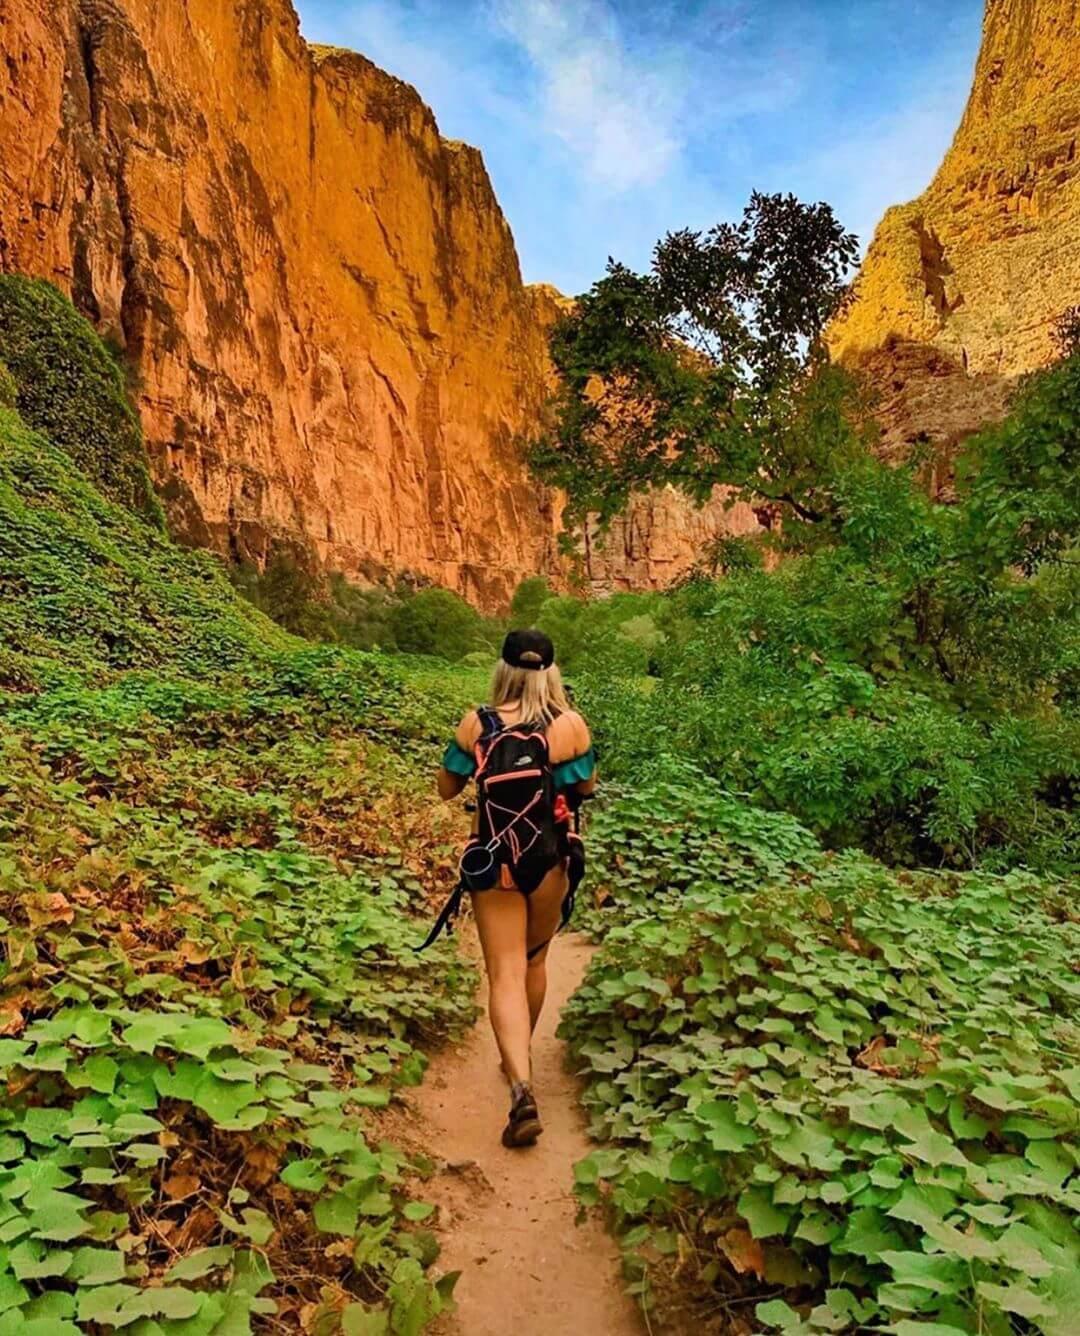 hiking outdoors in arizona